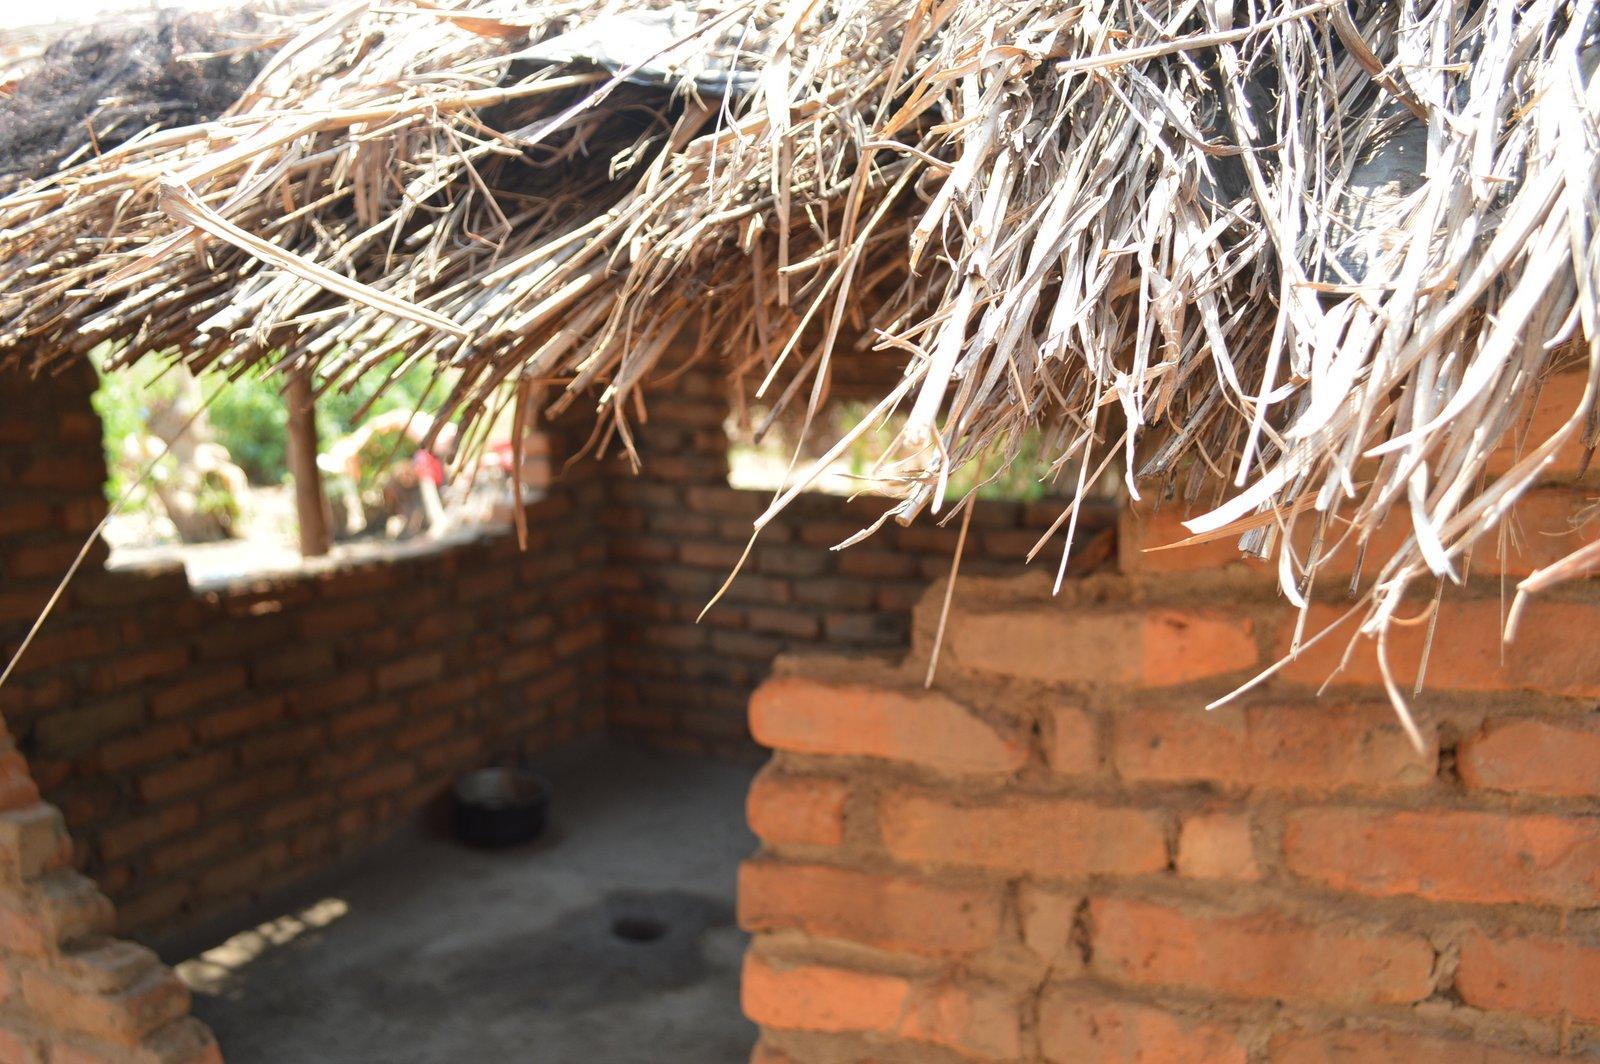 Gwete, Nkhata Bay (19).JPG